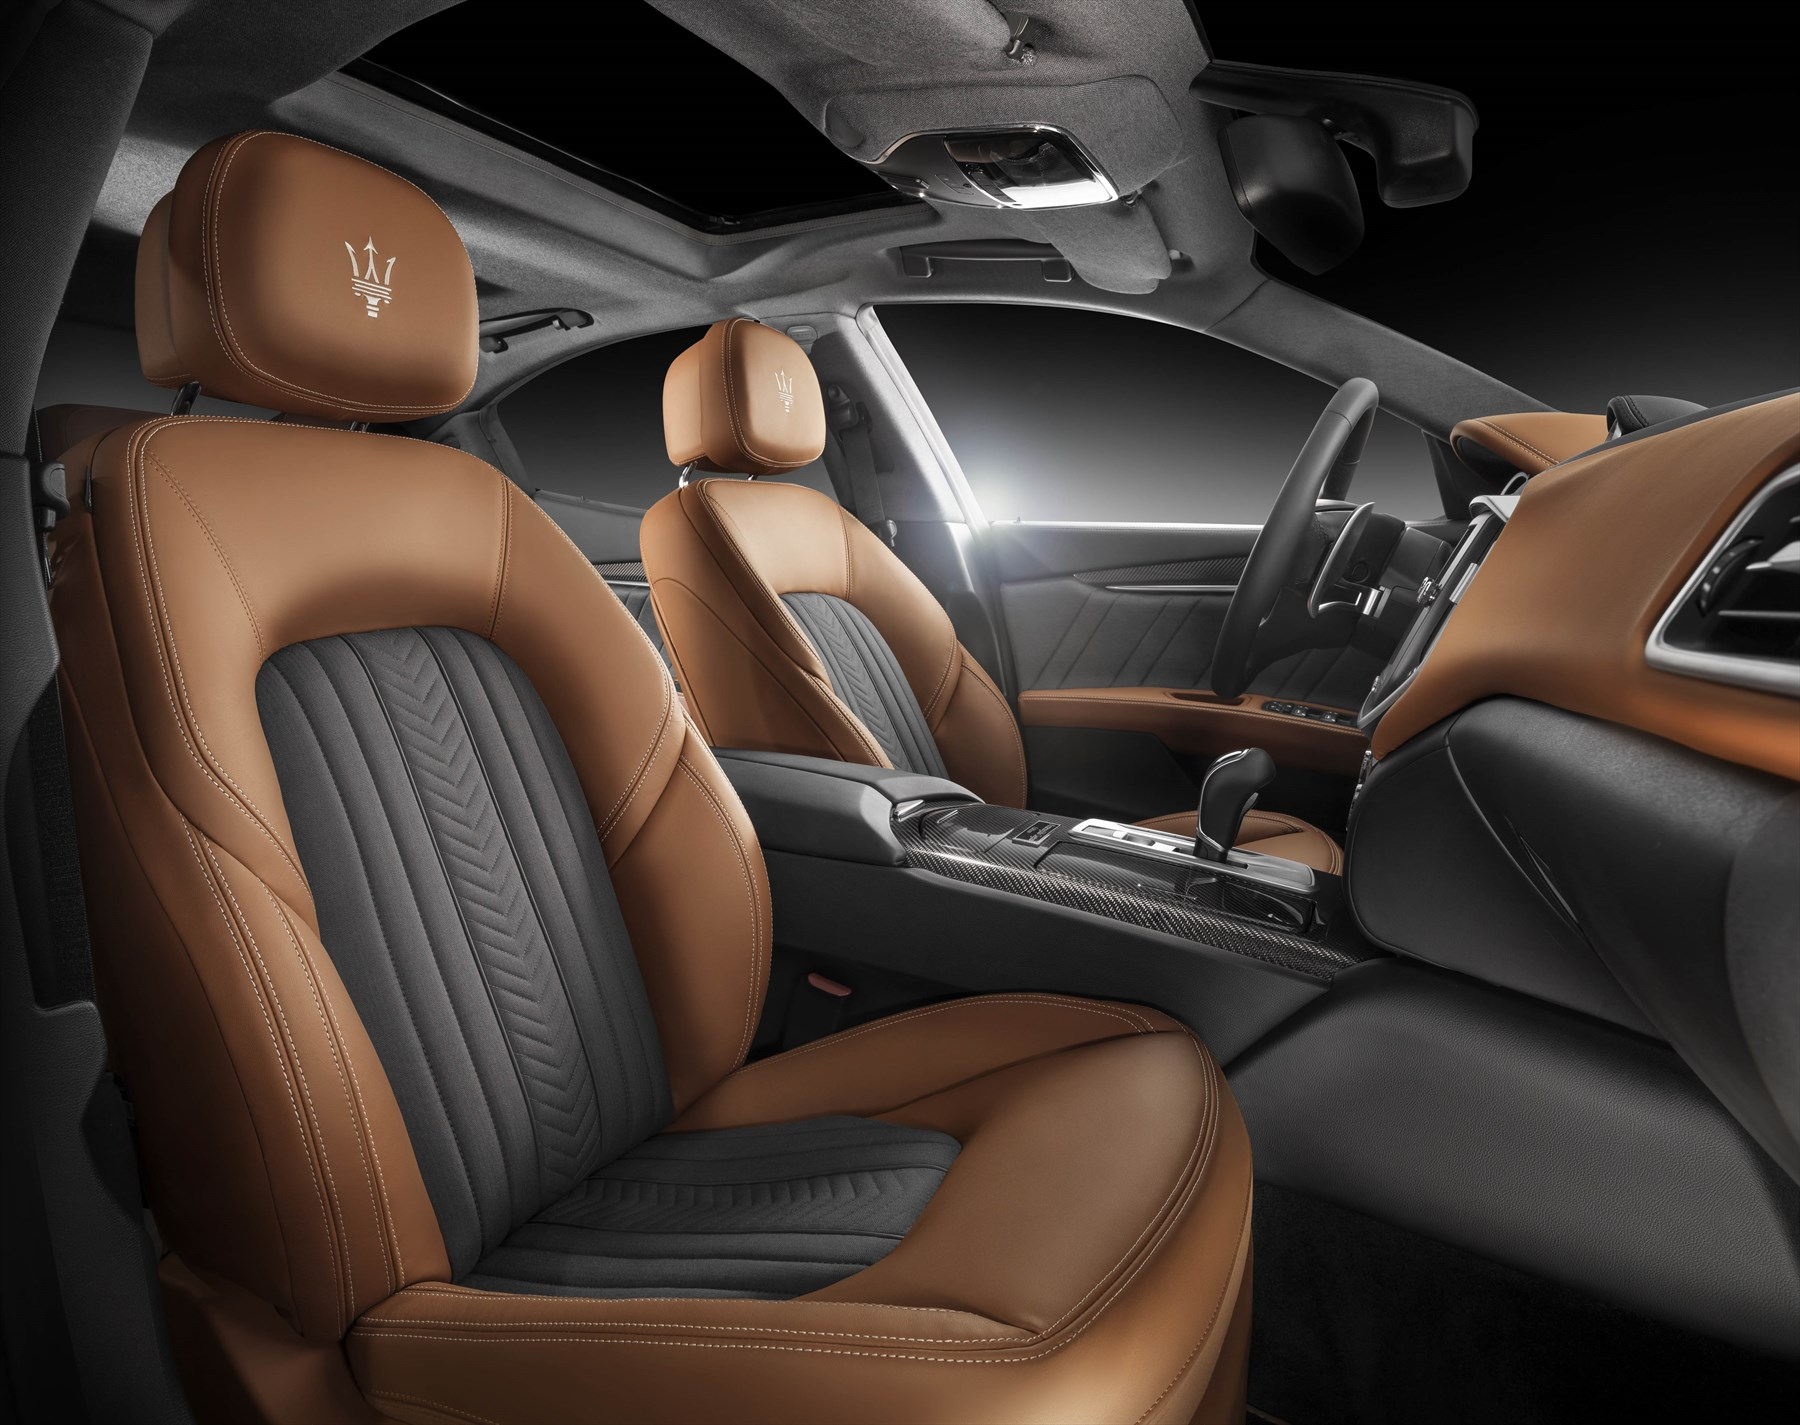 Maserati Ghibli S Q4 Concept: Latest News